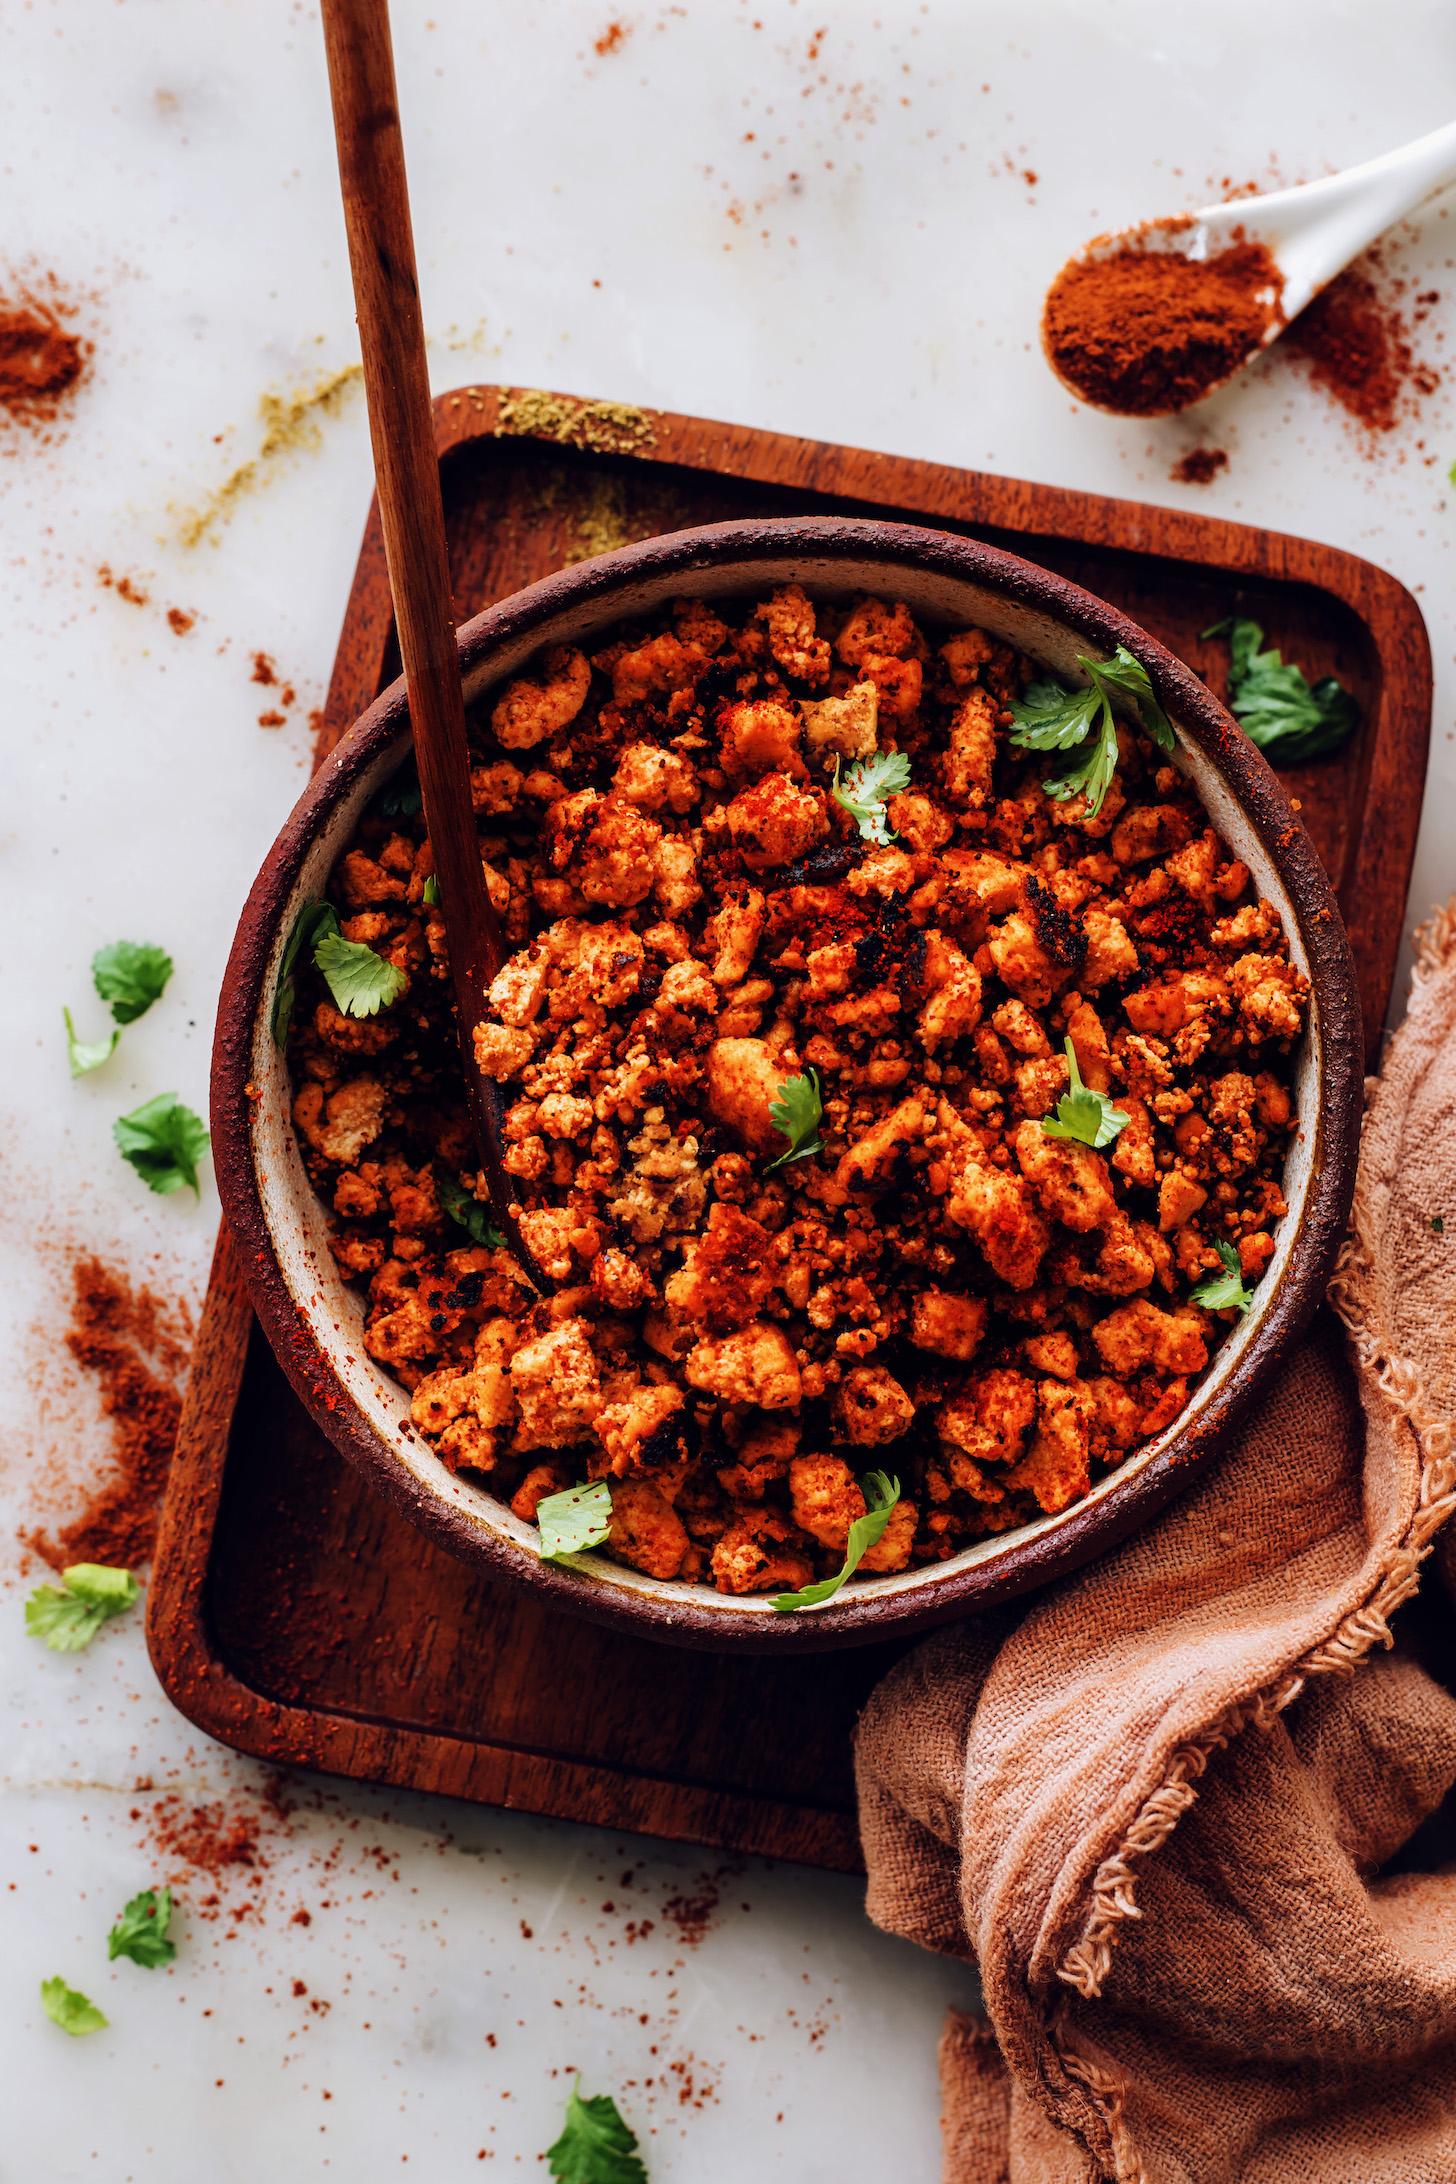 Bowl of crispy vegan chorizo sausage sprinkled with fresh cilantro